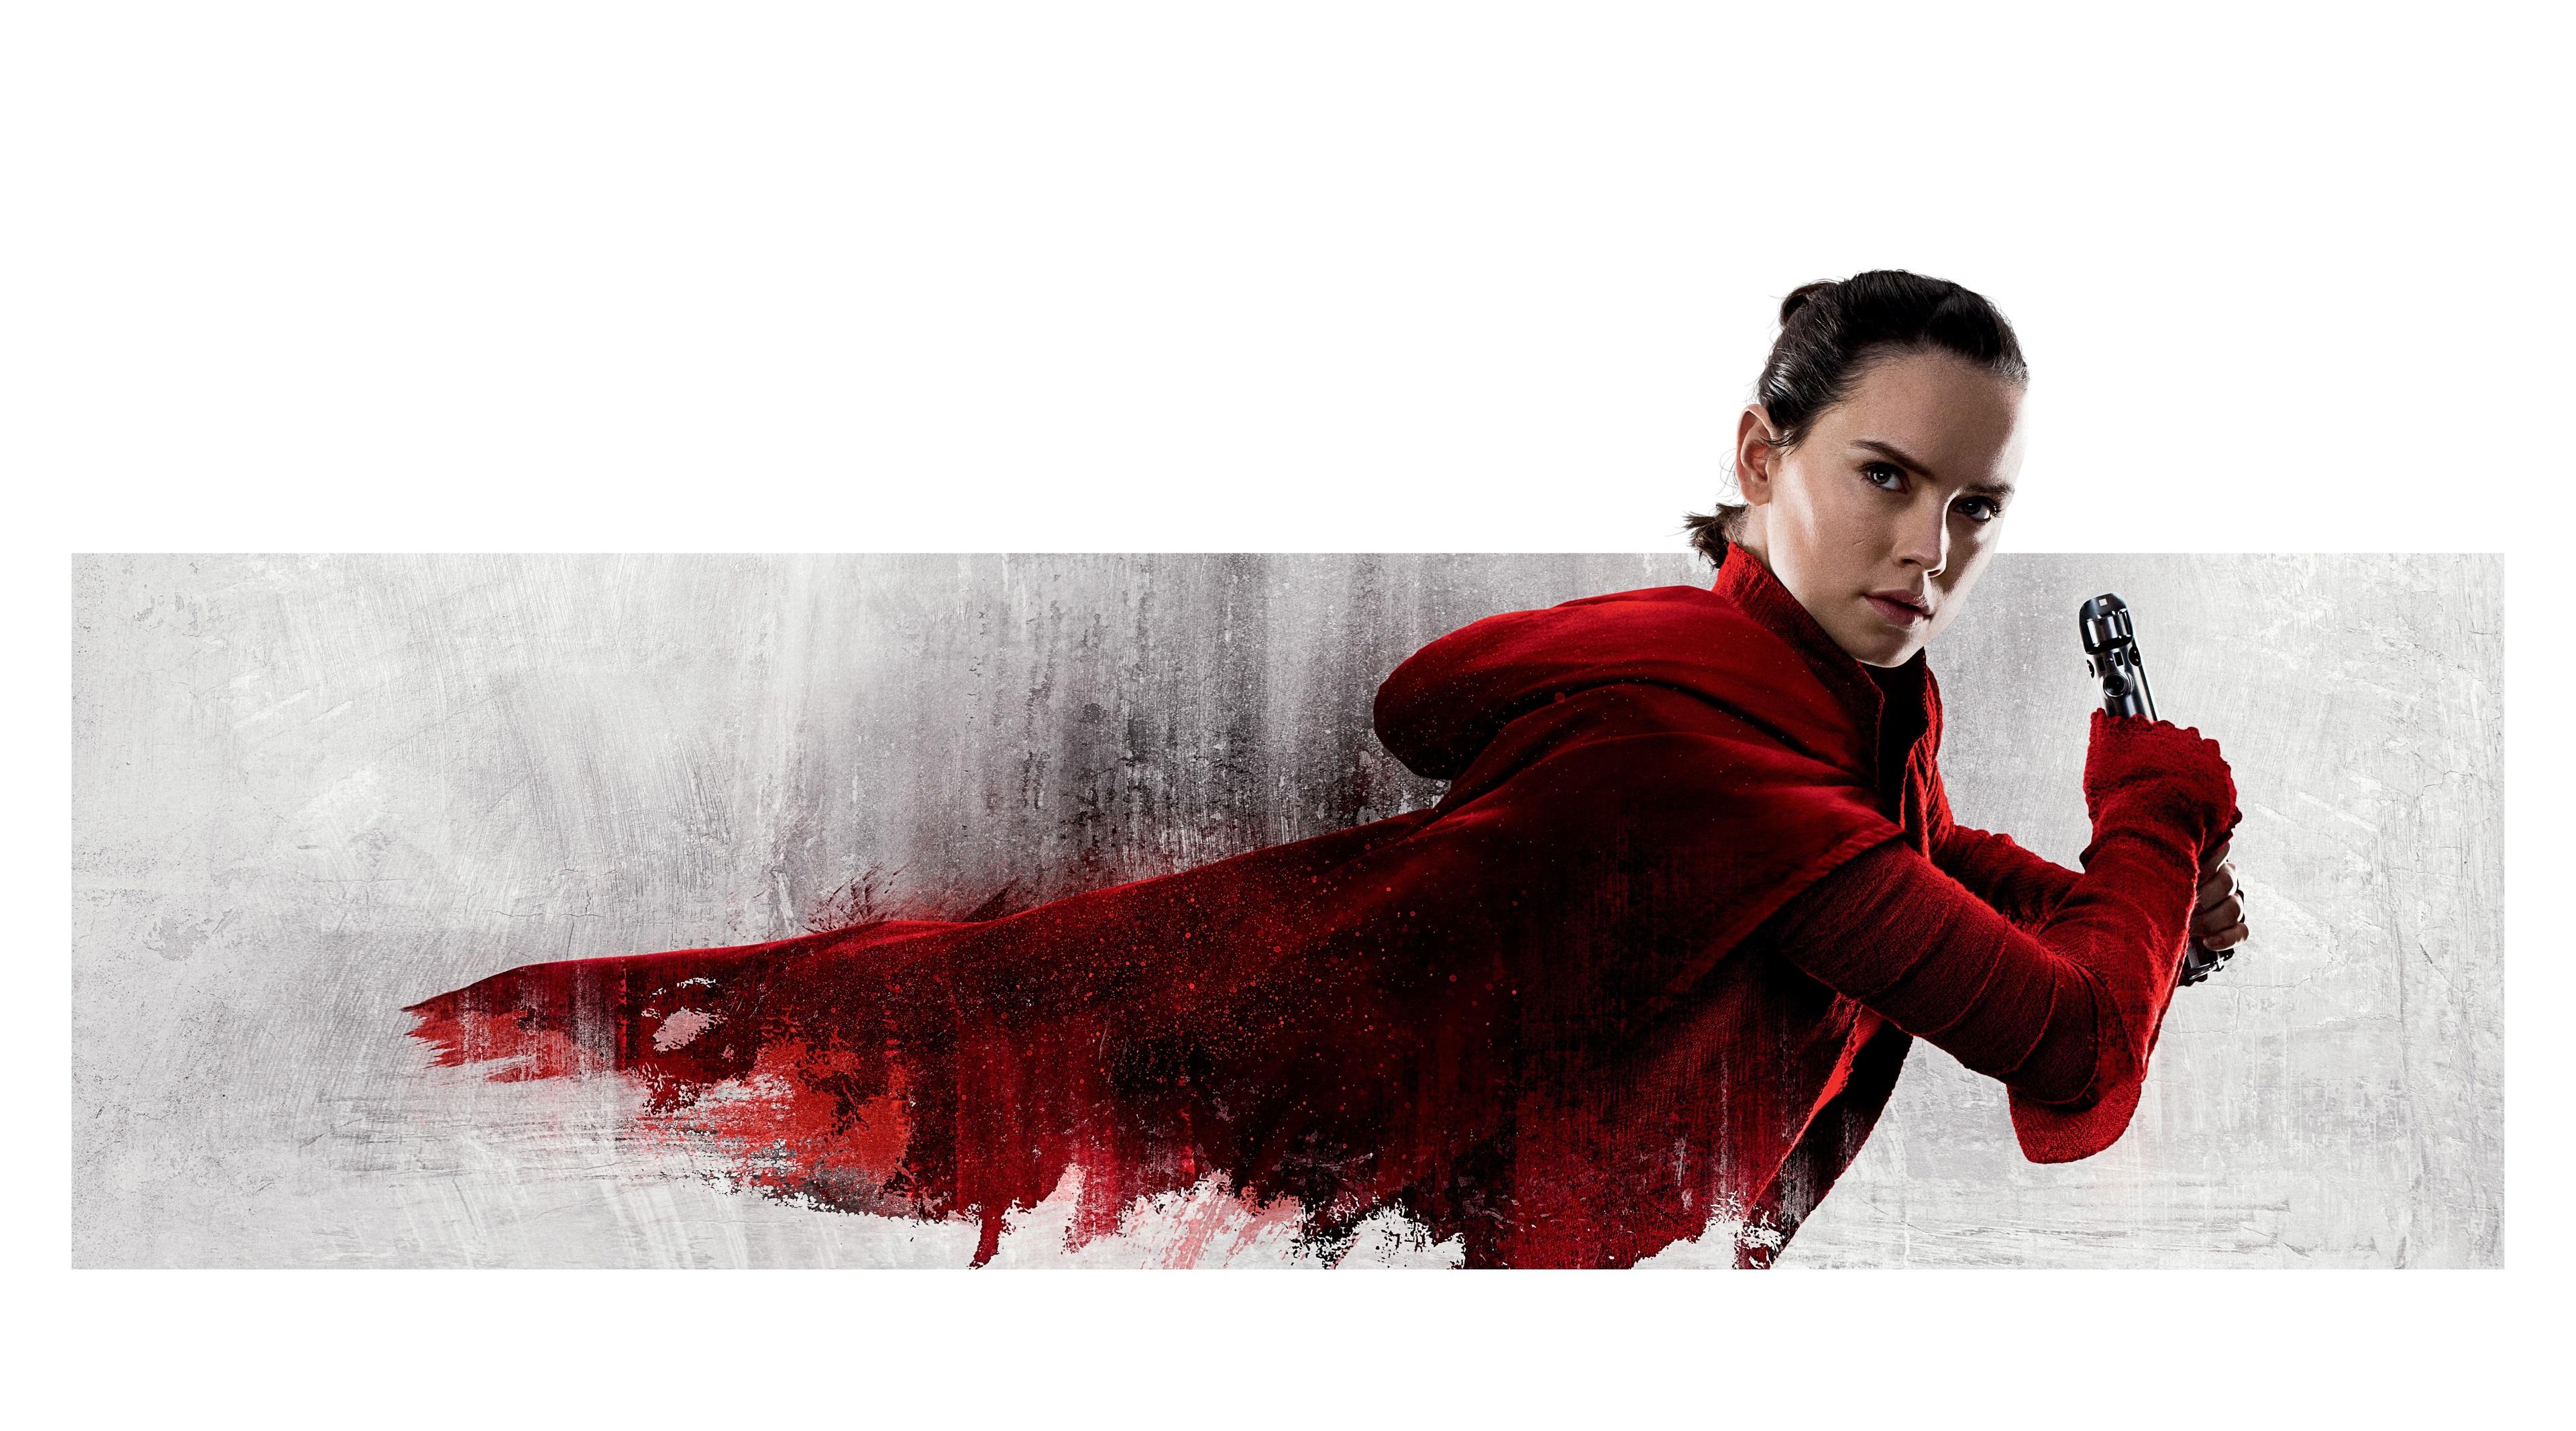 Star Wars The Last Jedi 4k Desktop Wallpaper High Resolution